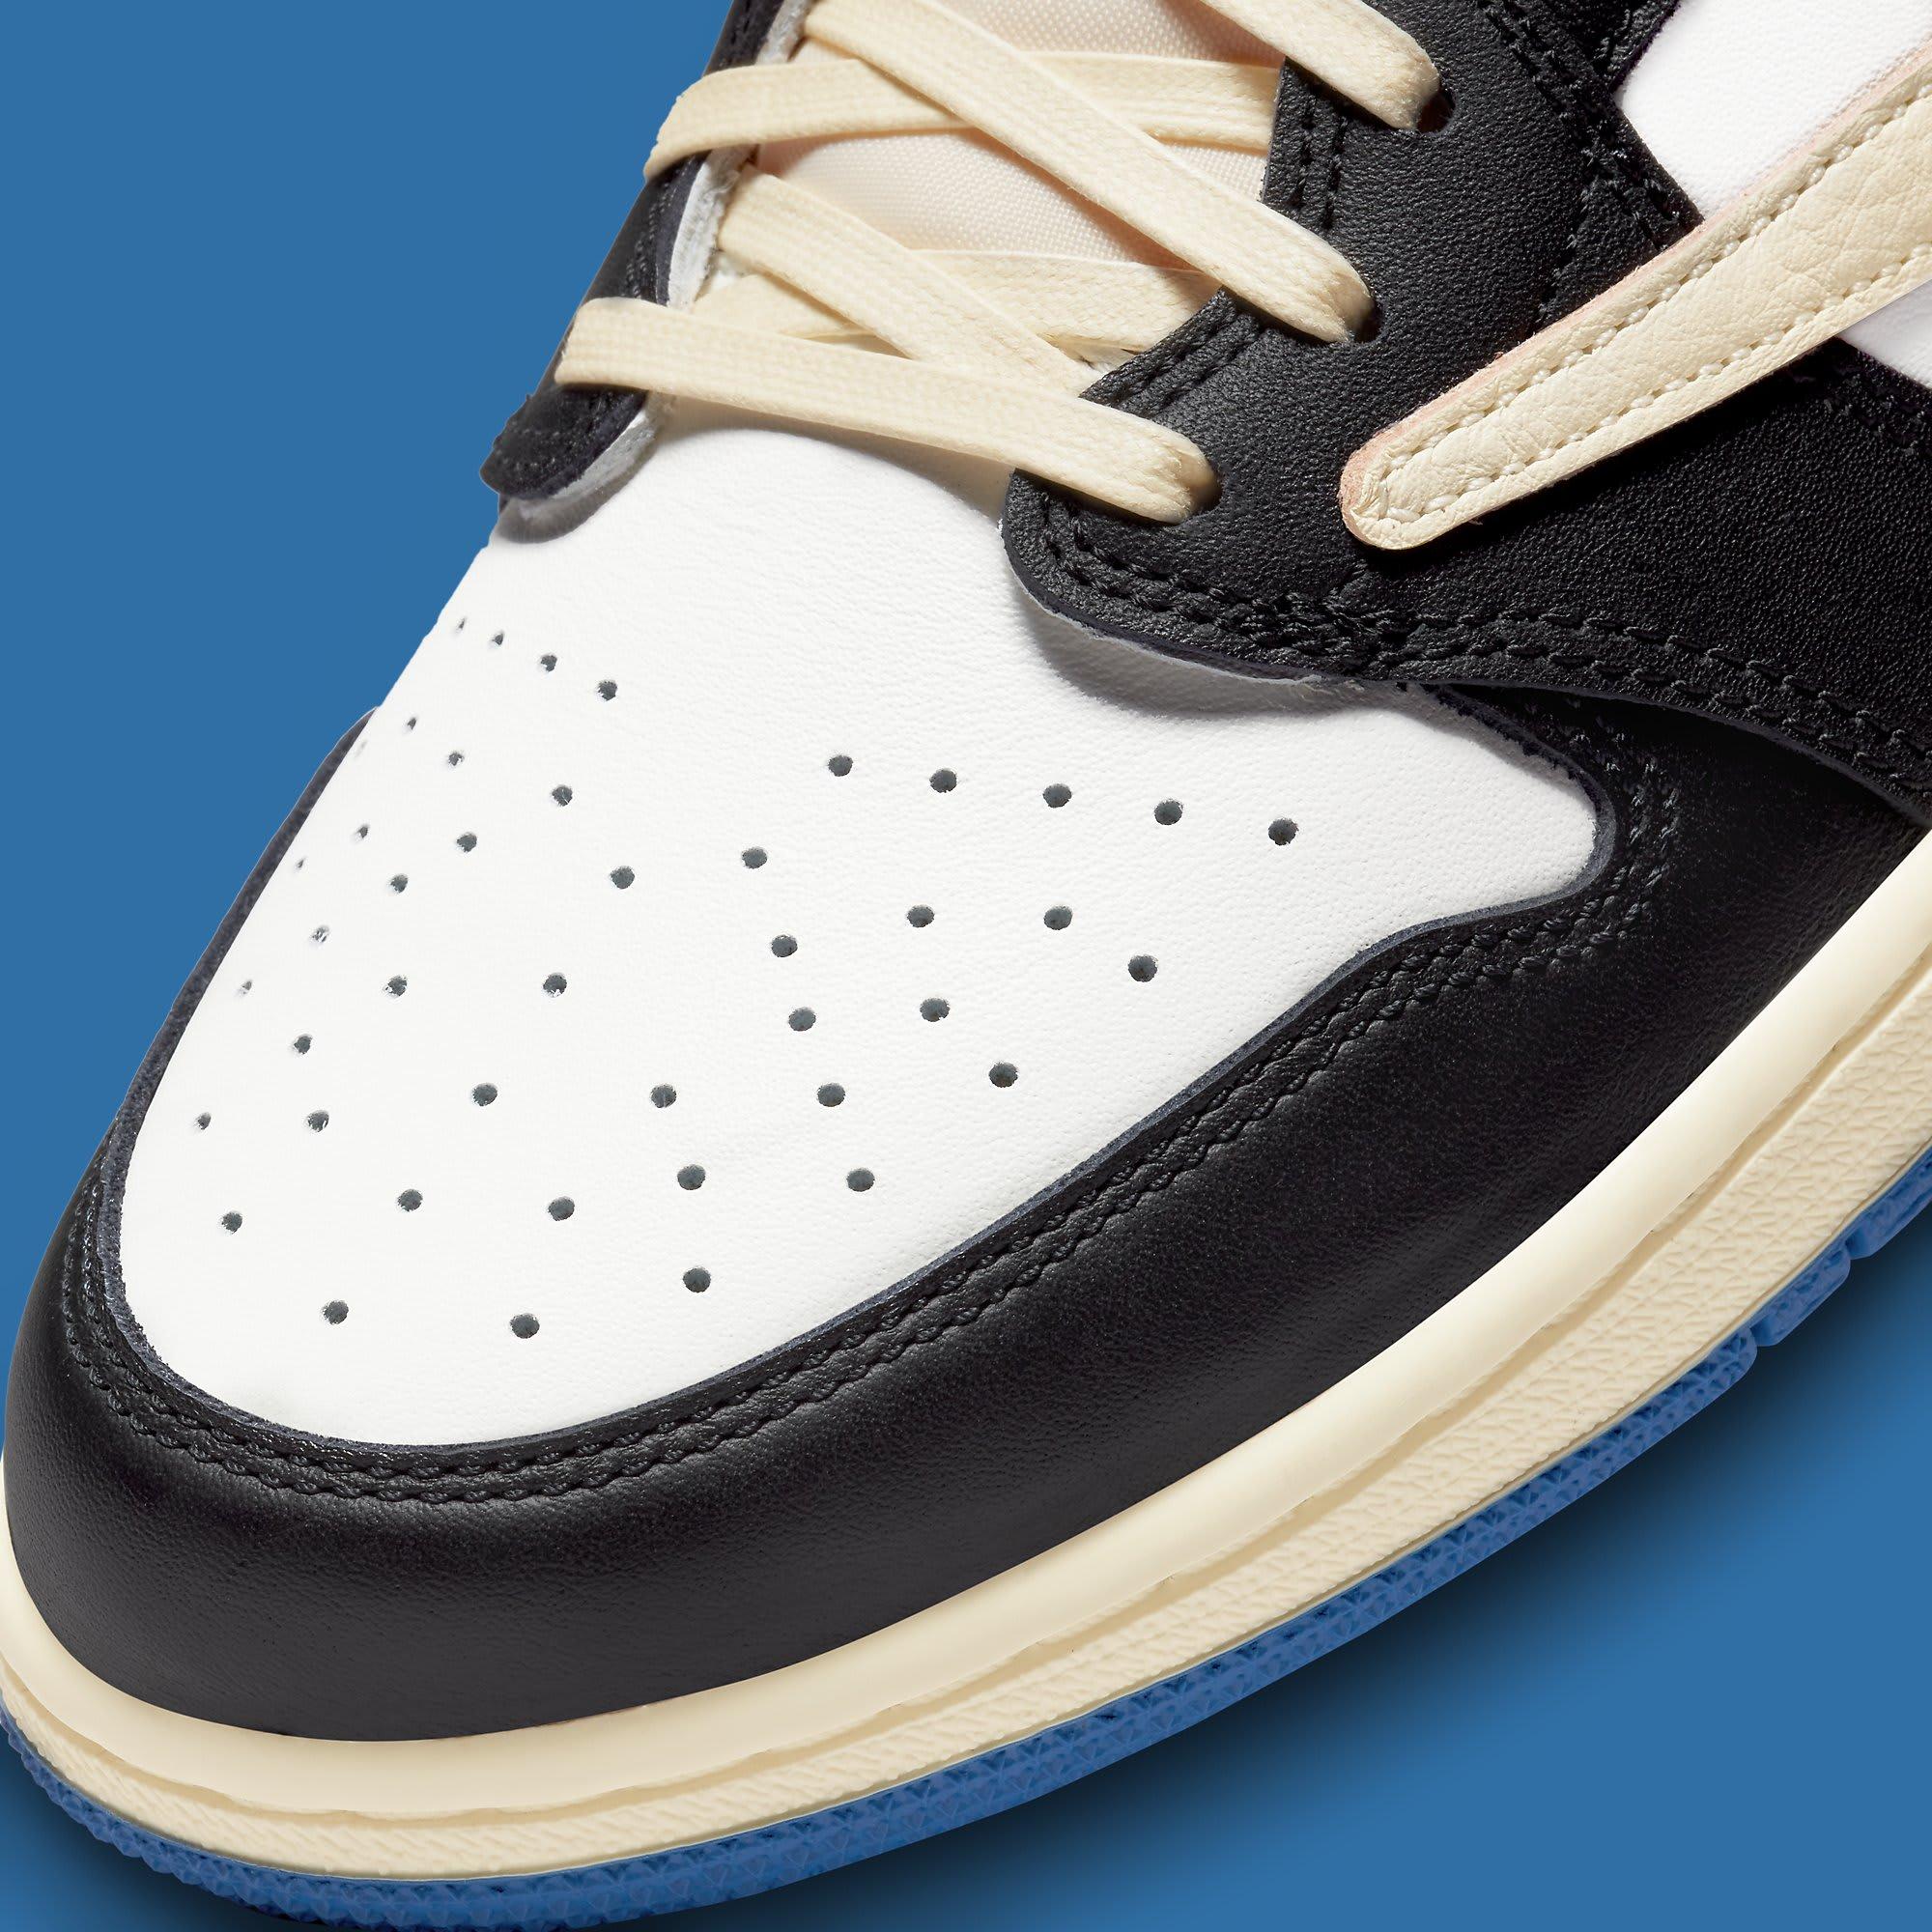 Travis Scott x Fragment x Air Jordan 1 Low Release Date DM7866-140 Toe